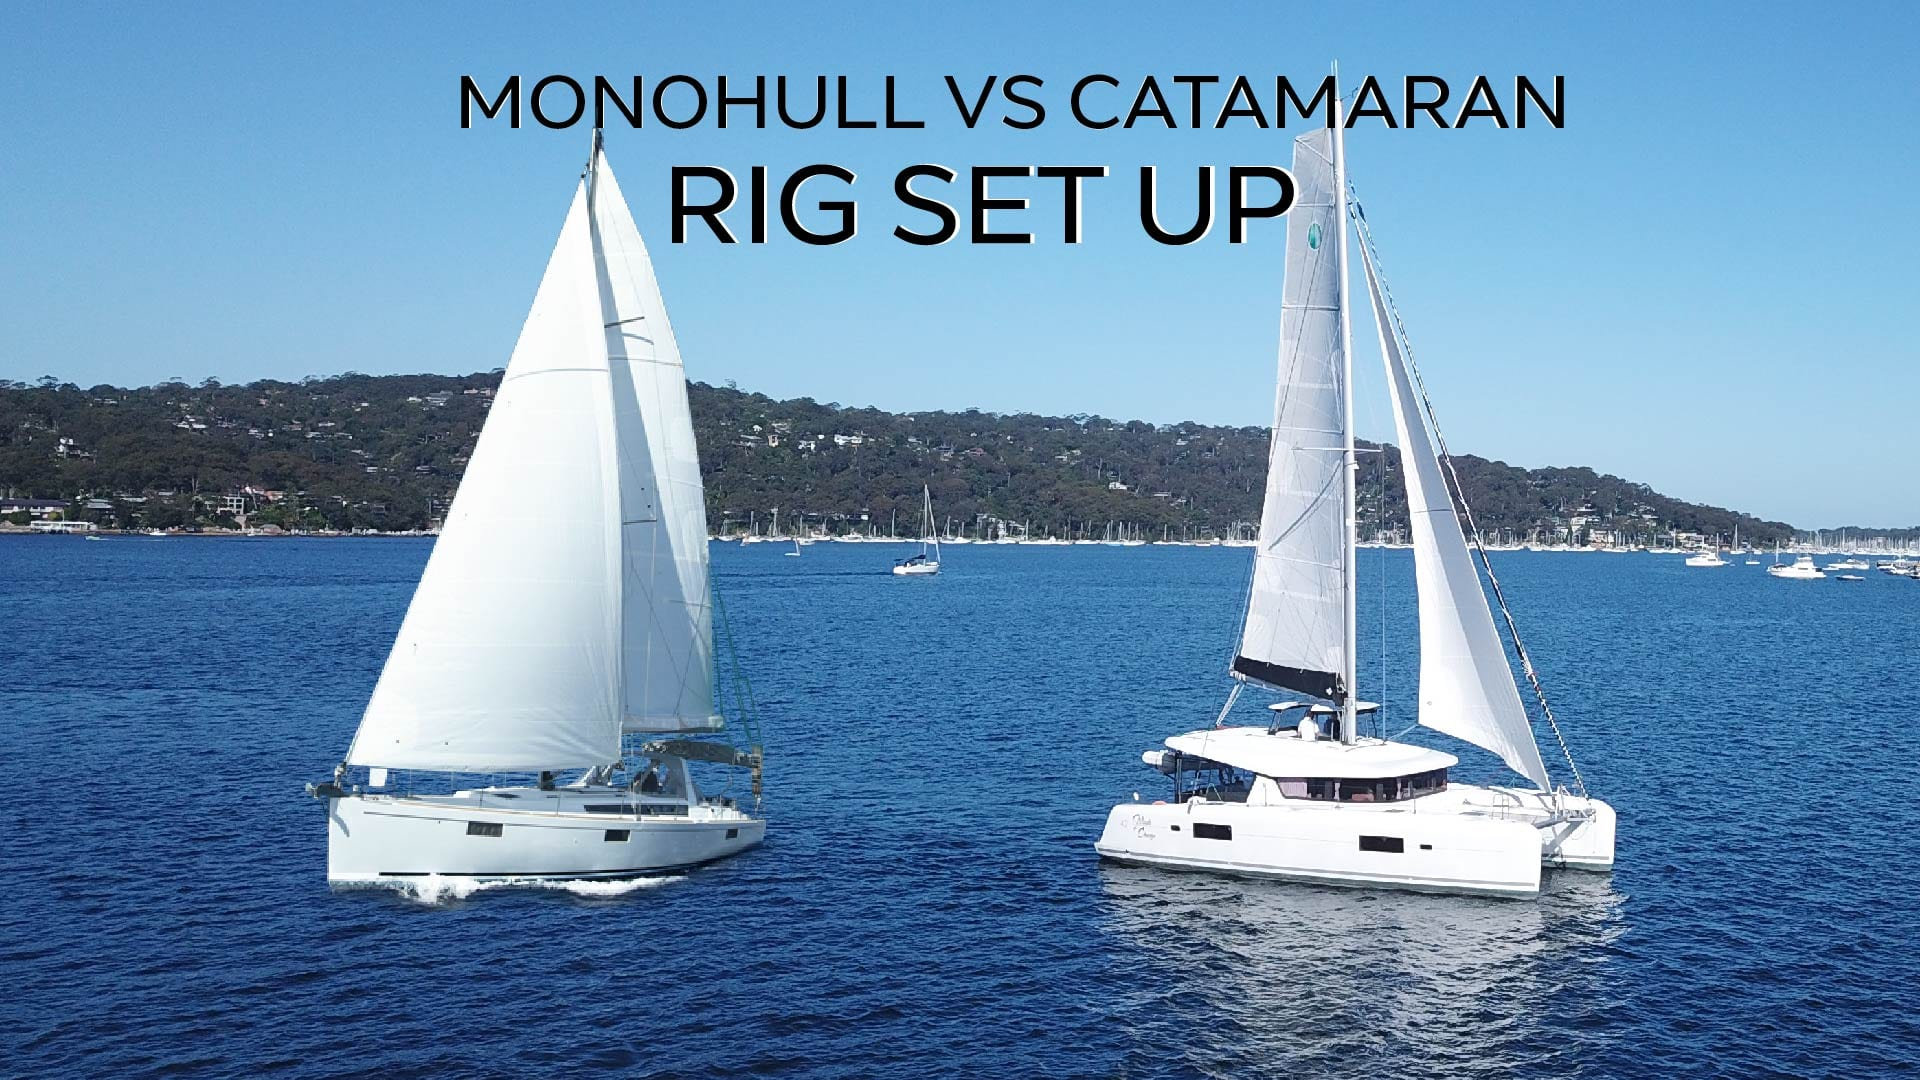 CATAMARAN VS MONOHULL RIG SET UP